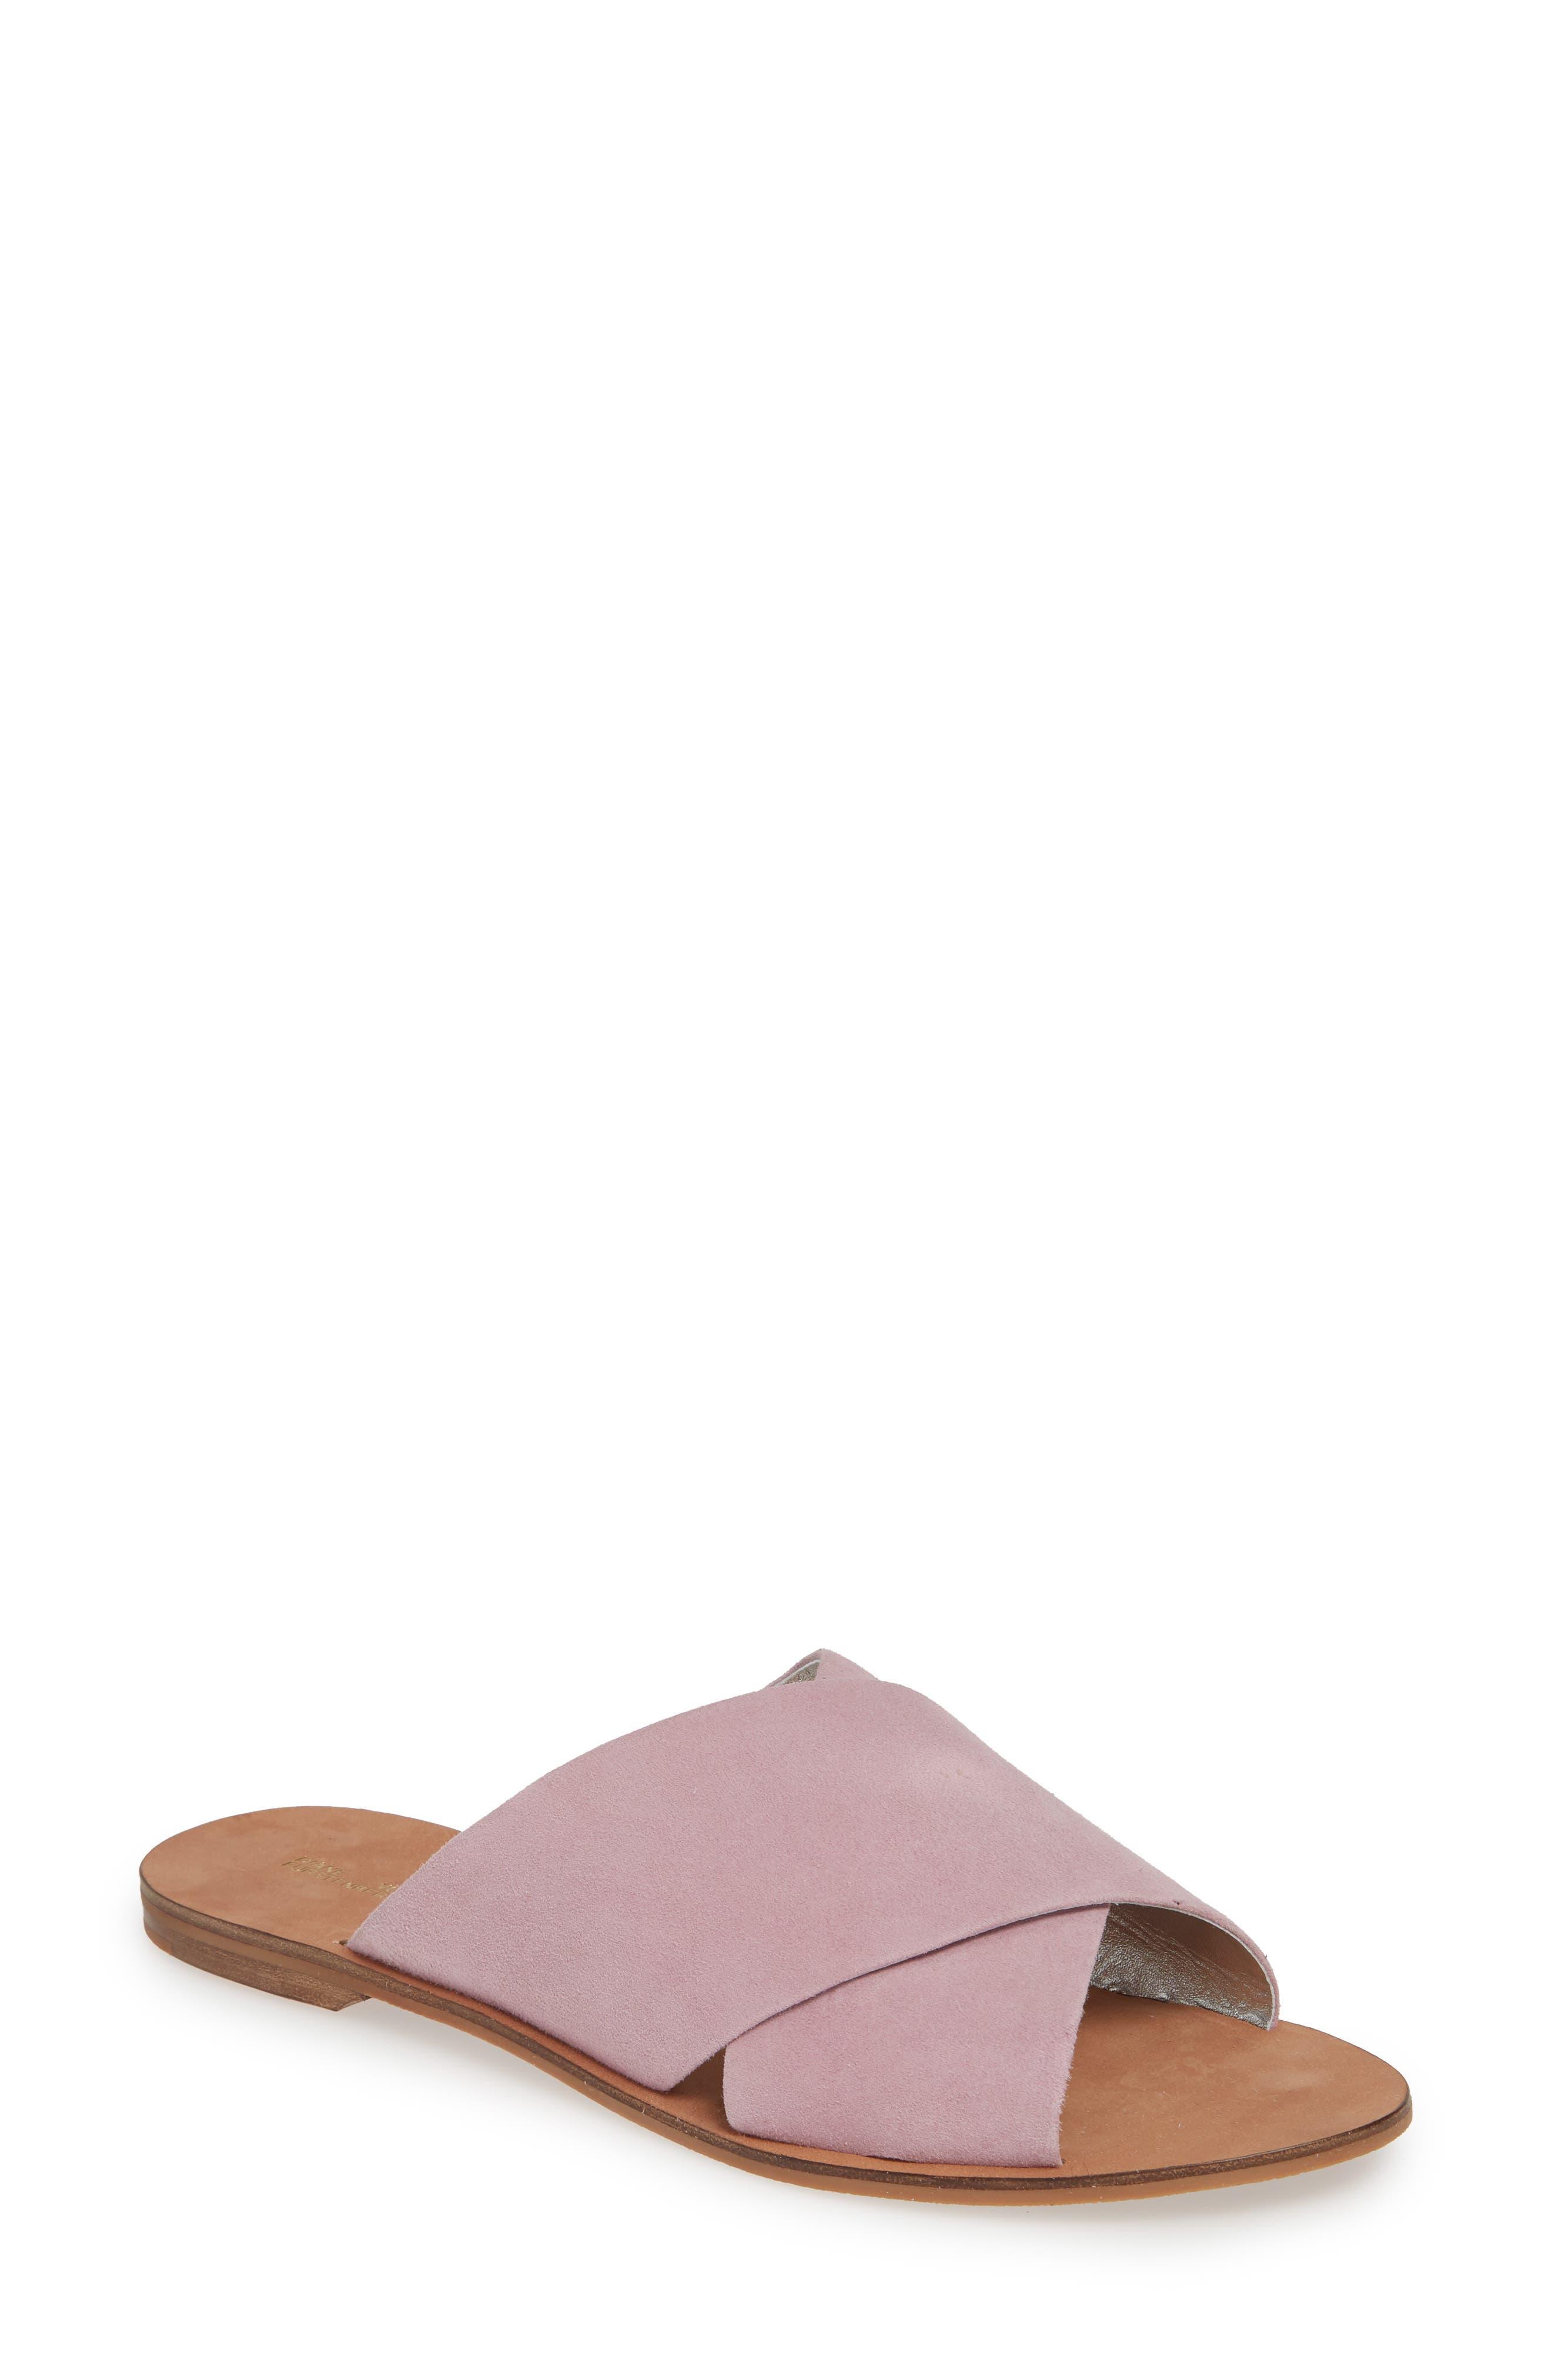 Bailie Sandal, Main, color, AMETHYST